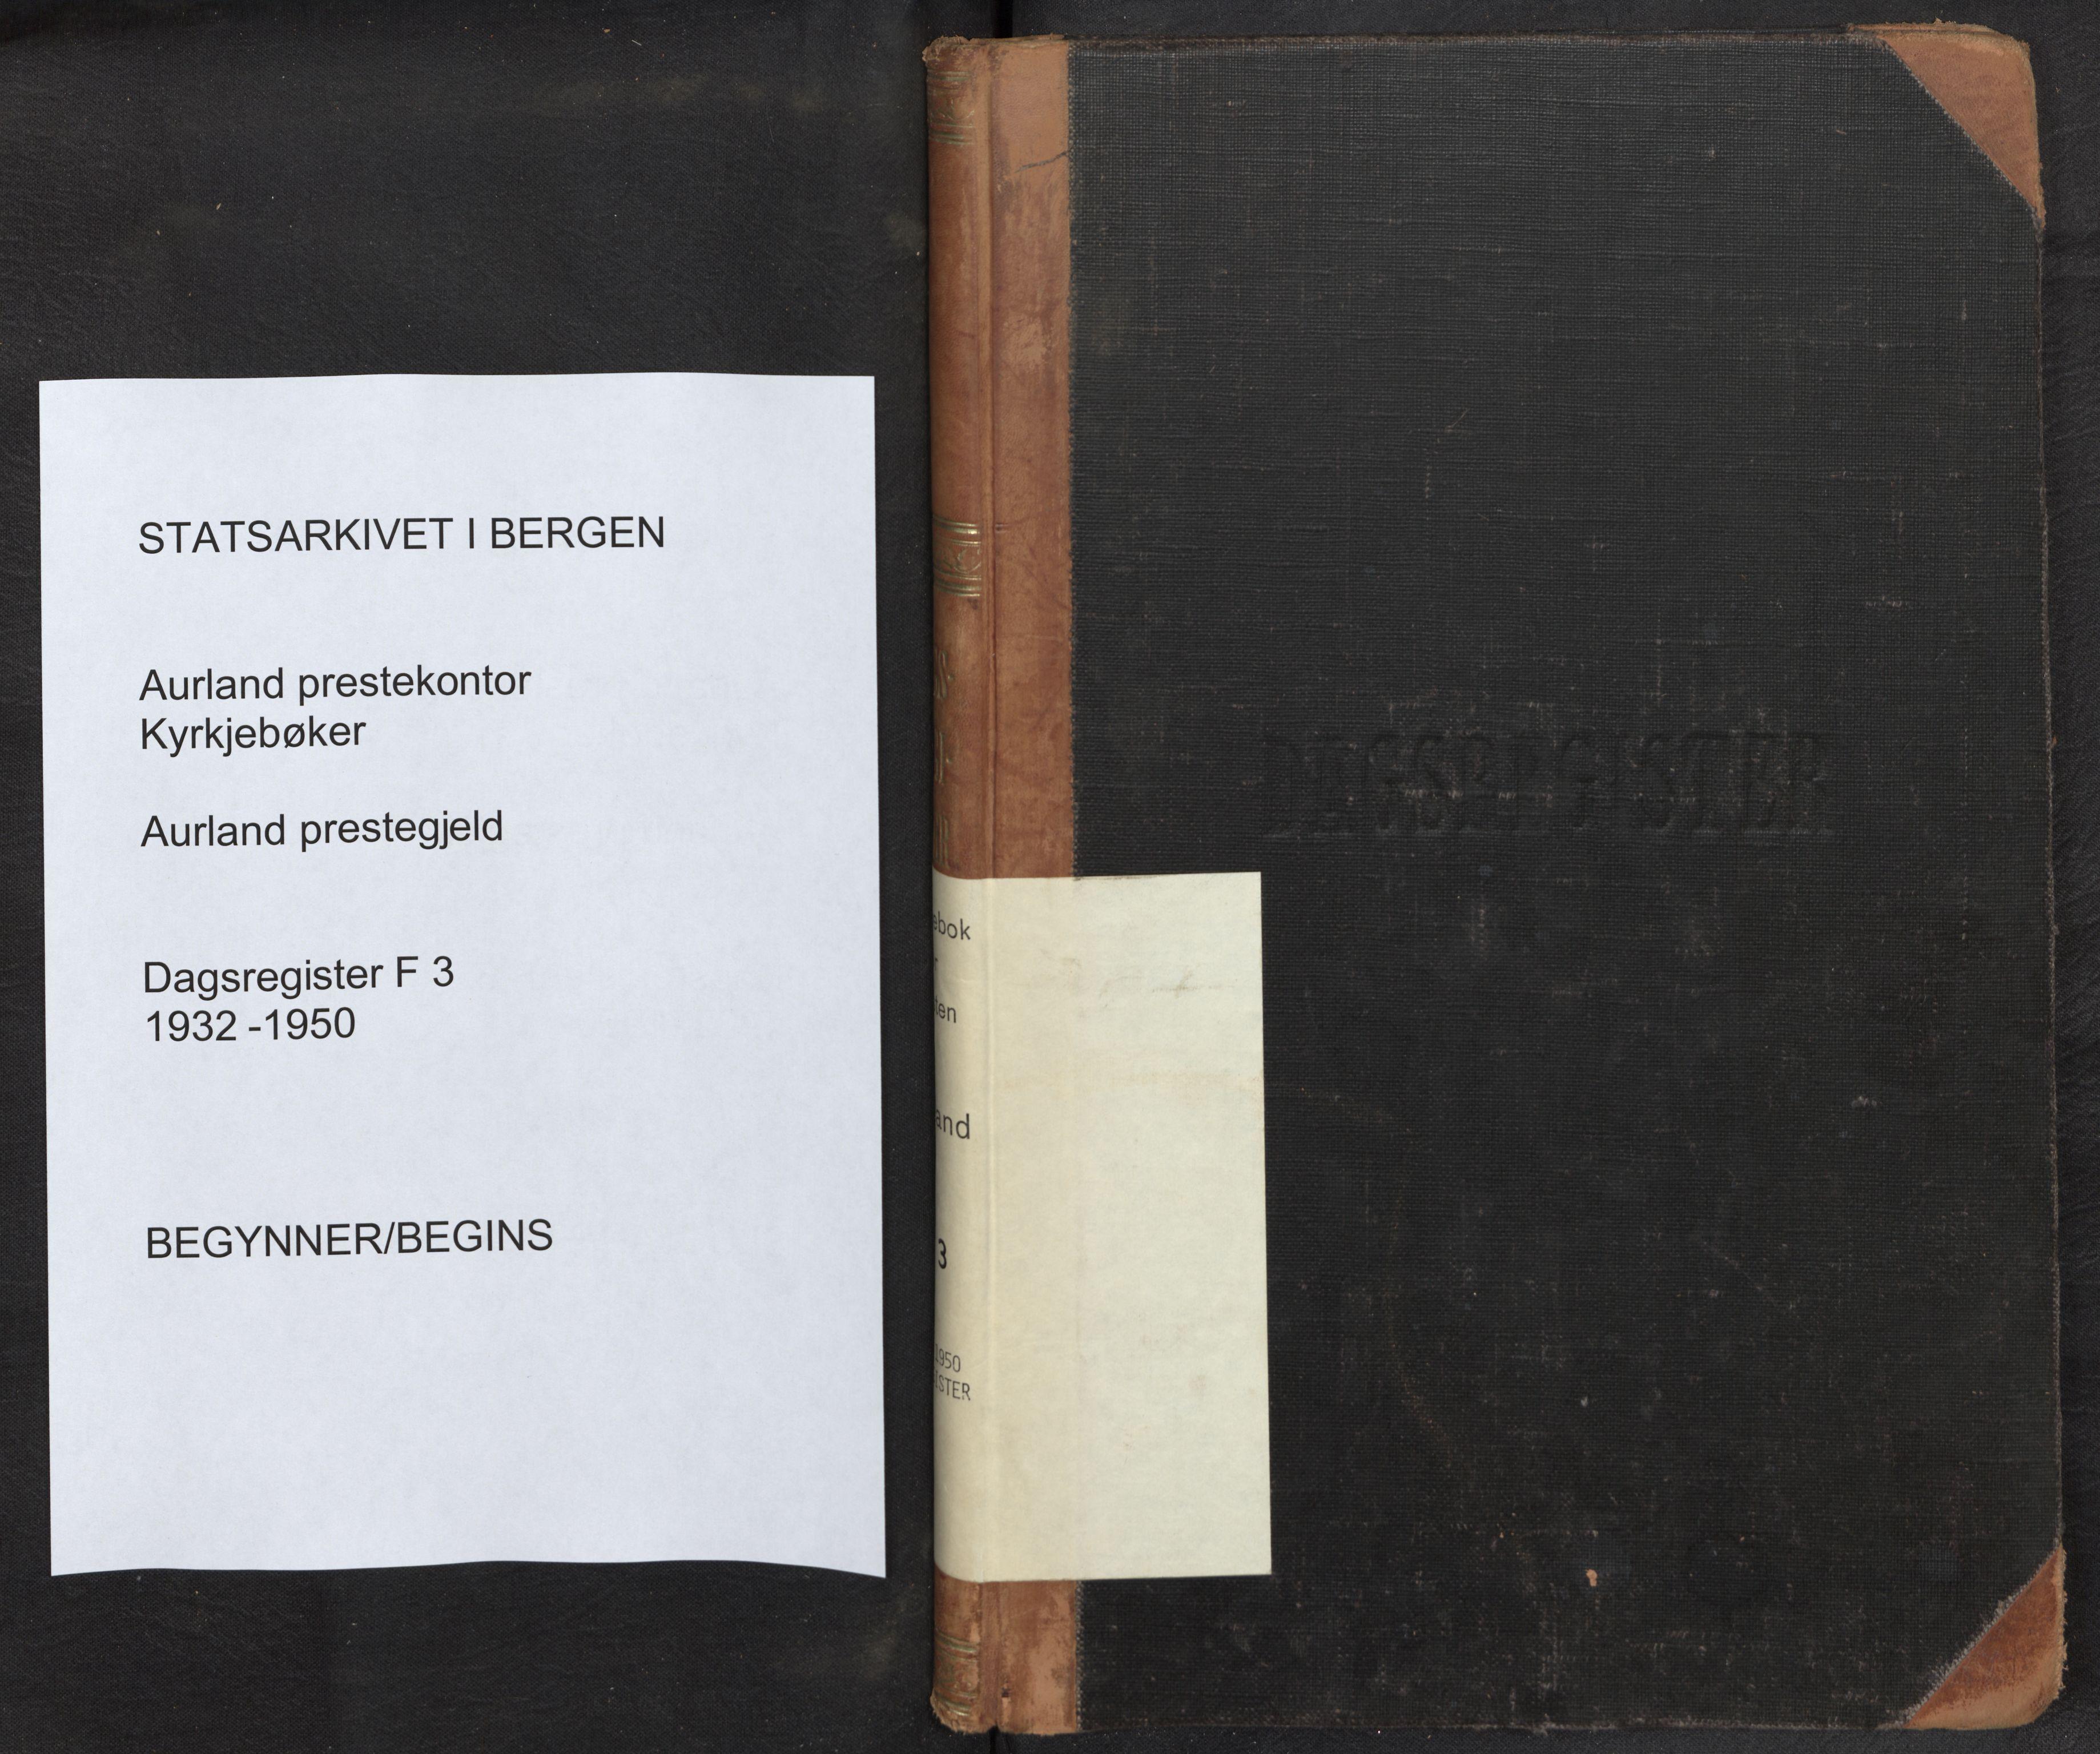 SAB, Aurland Sokneprestembete*, Dagregister nr. F 3, 1932-1950